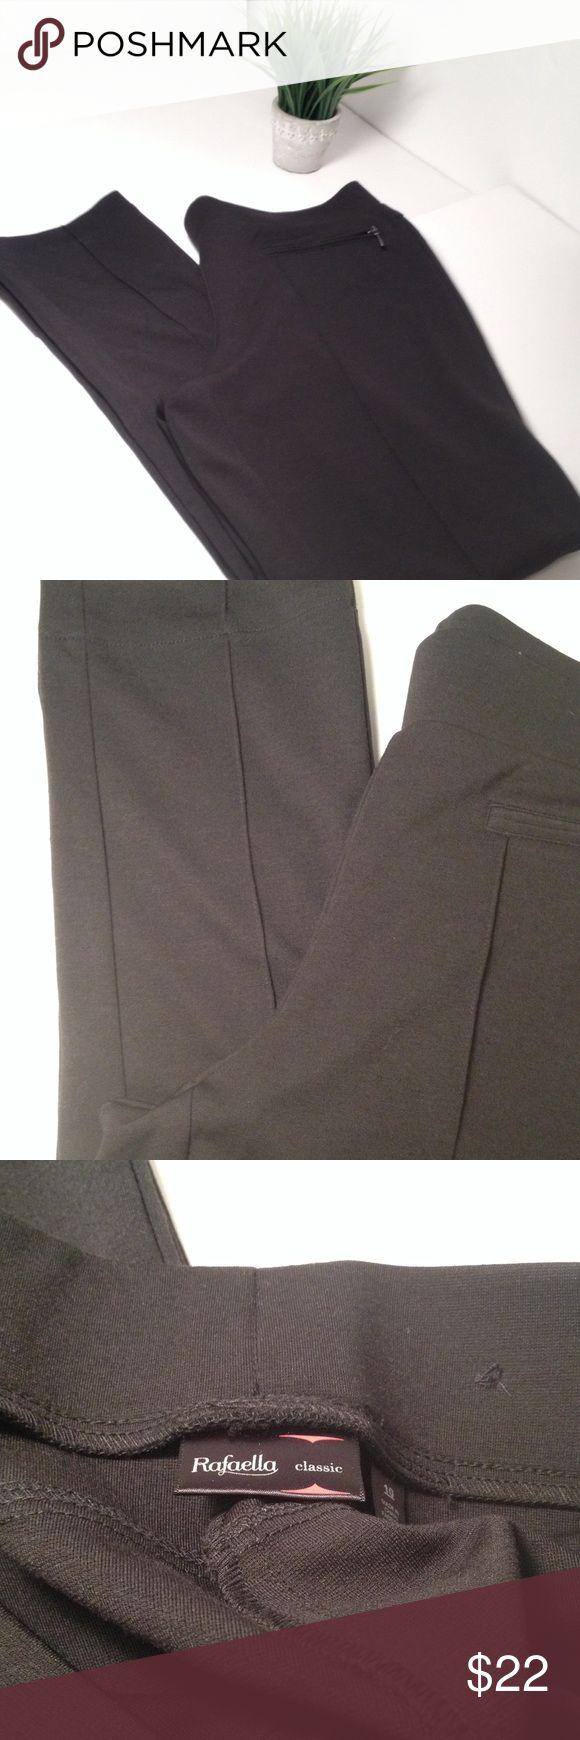 Rafaella Pants Rafaella Pants. Size 10 and composition is a polyester, rayon and spandex blend. Rafaella Pants Skinny